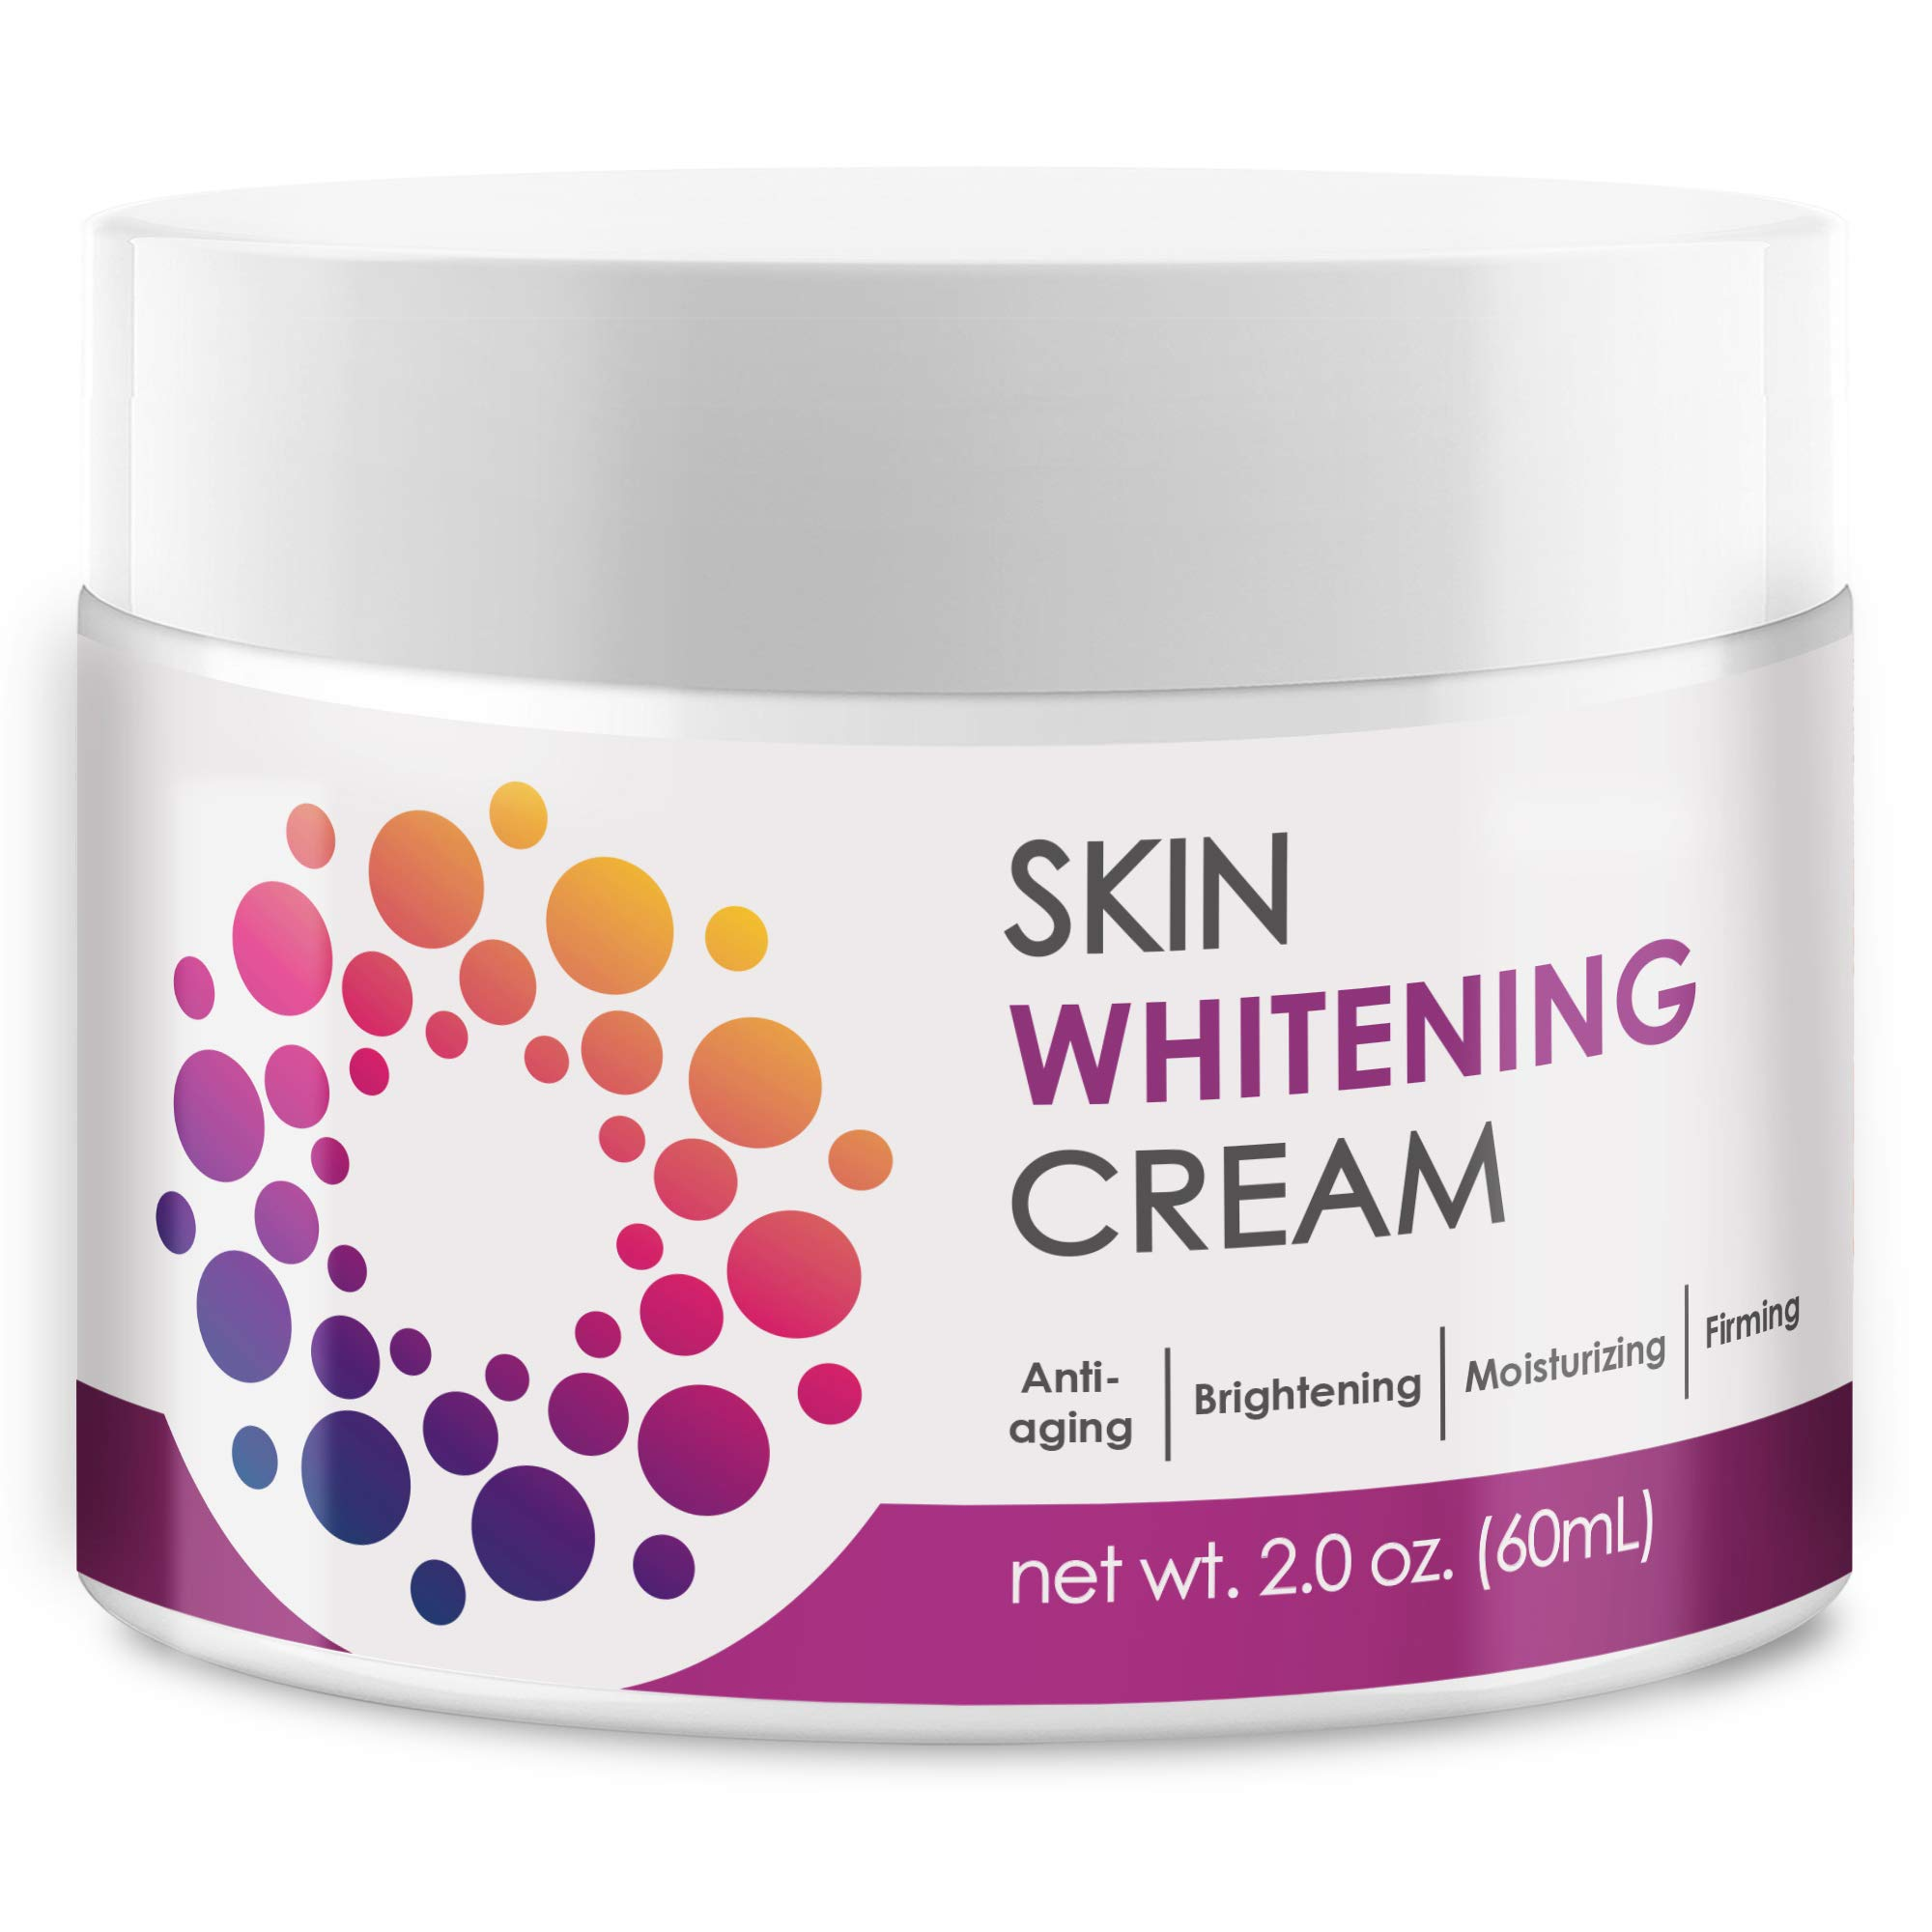 ACTIVSCIENCE Whitening Cream - Powerful Skin Lightening Cream for Face & Body. Dark Spot, Melasma & Hyperpigmentation Treatment. 2 fl oz.